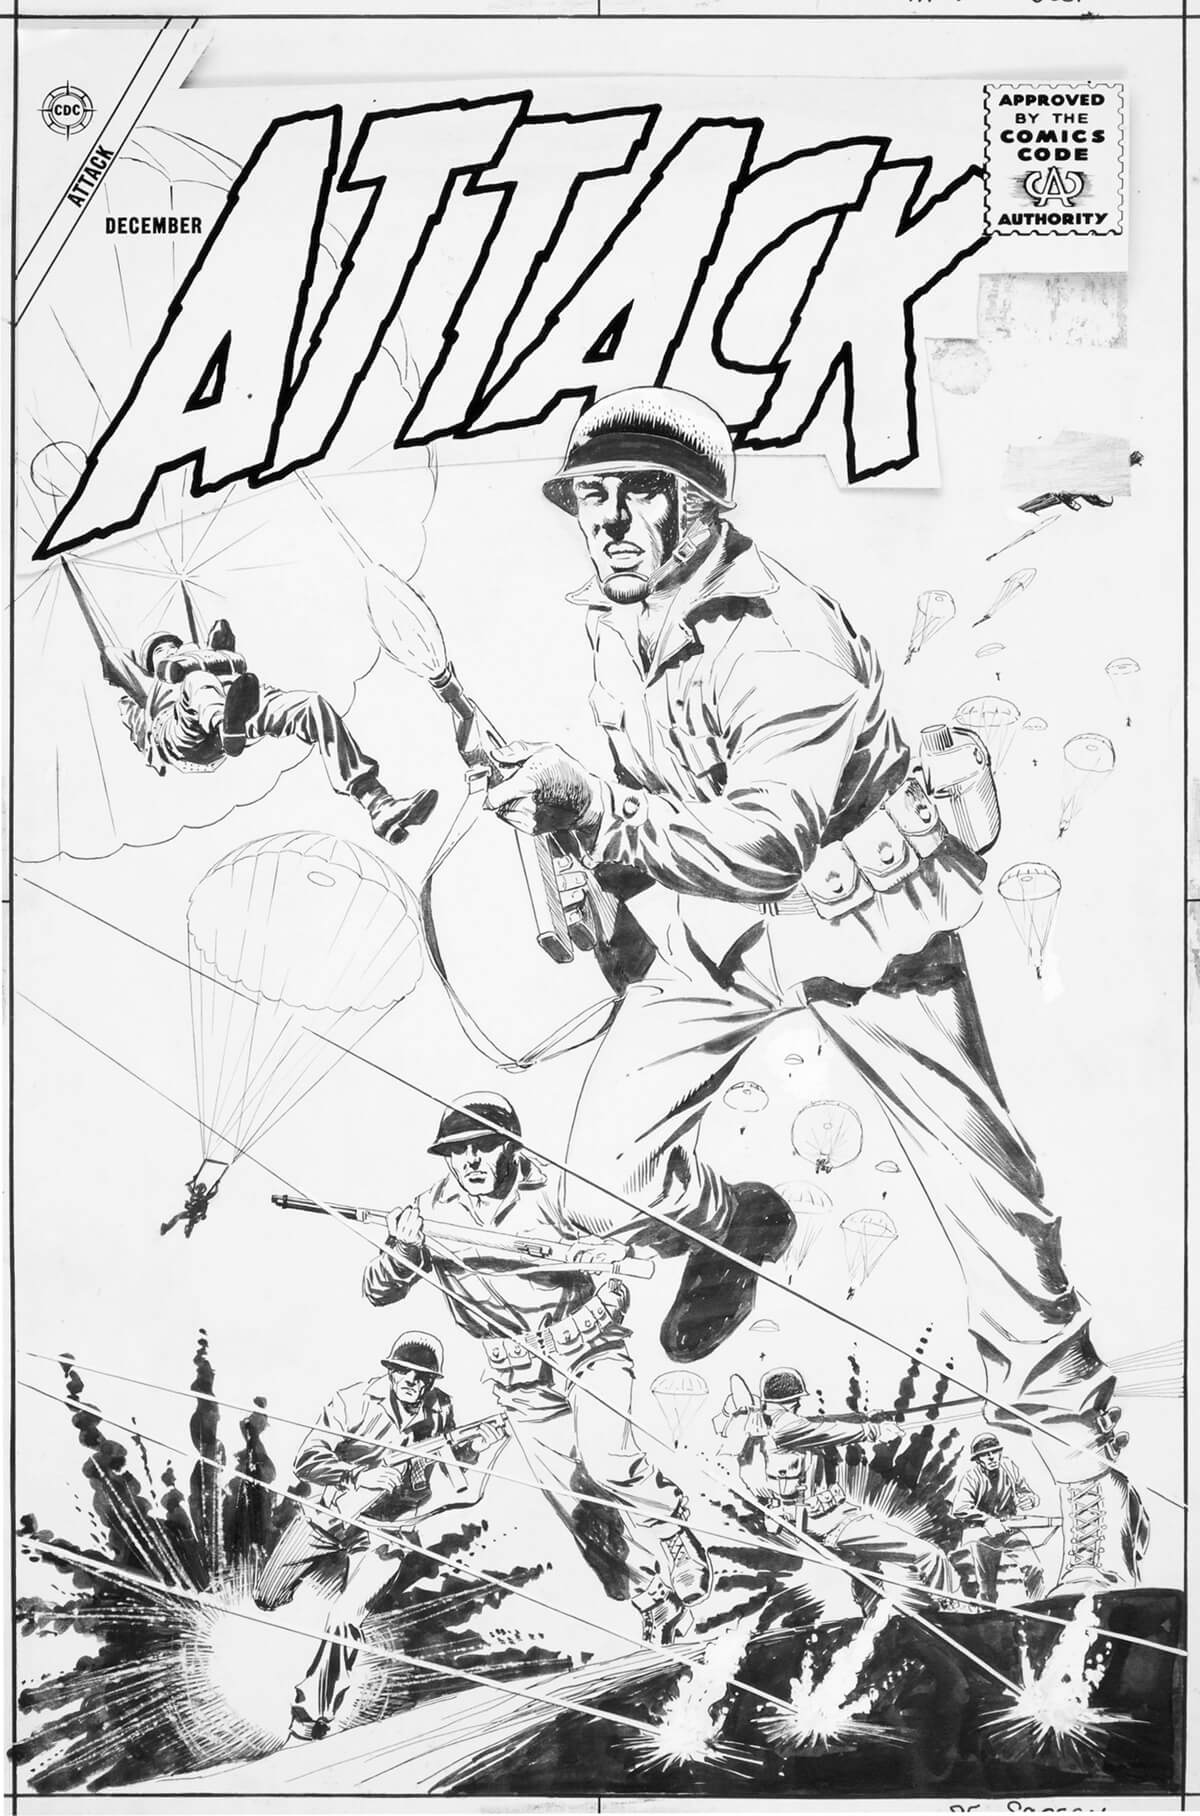 Comic book art restoration by Scott Dutton